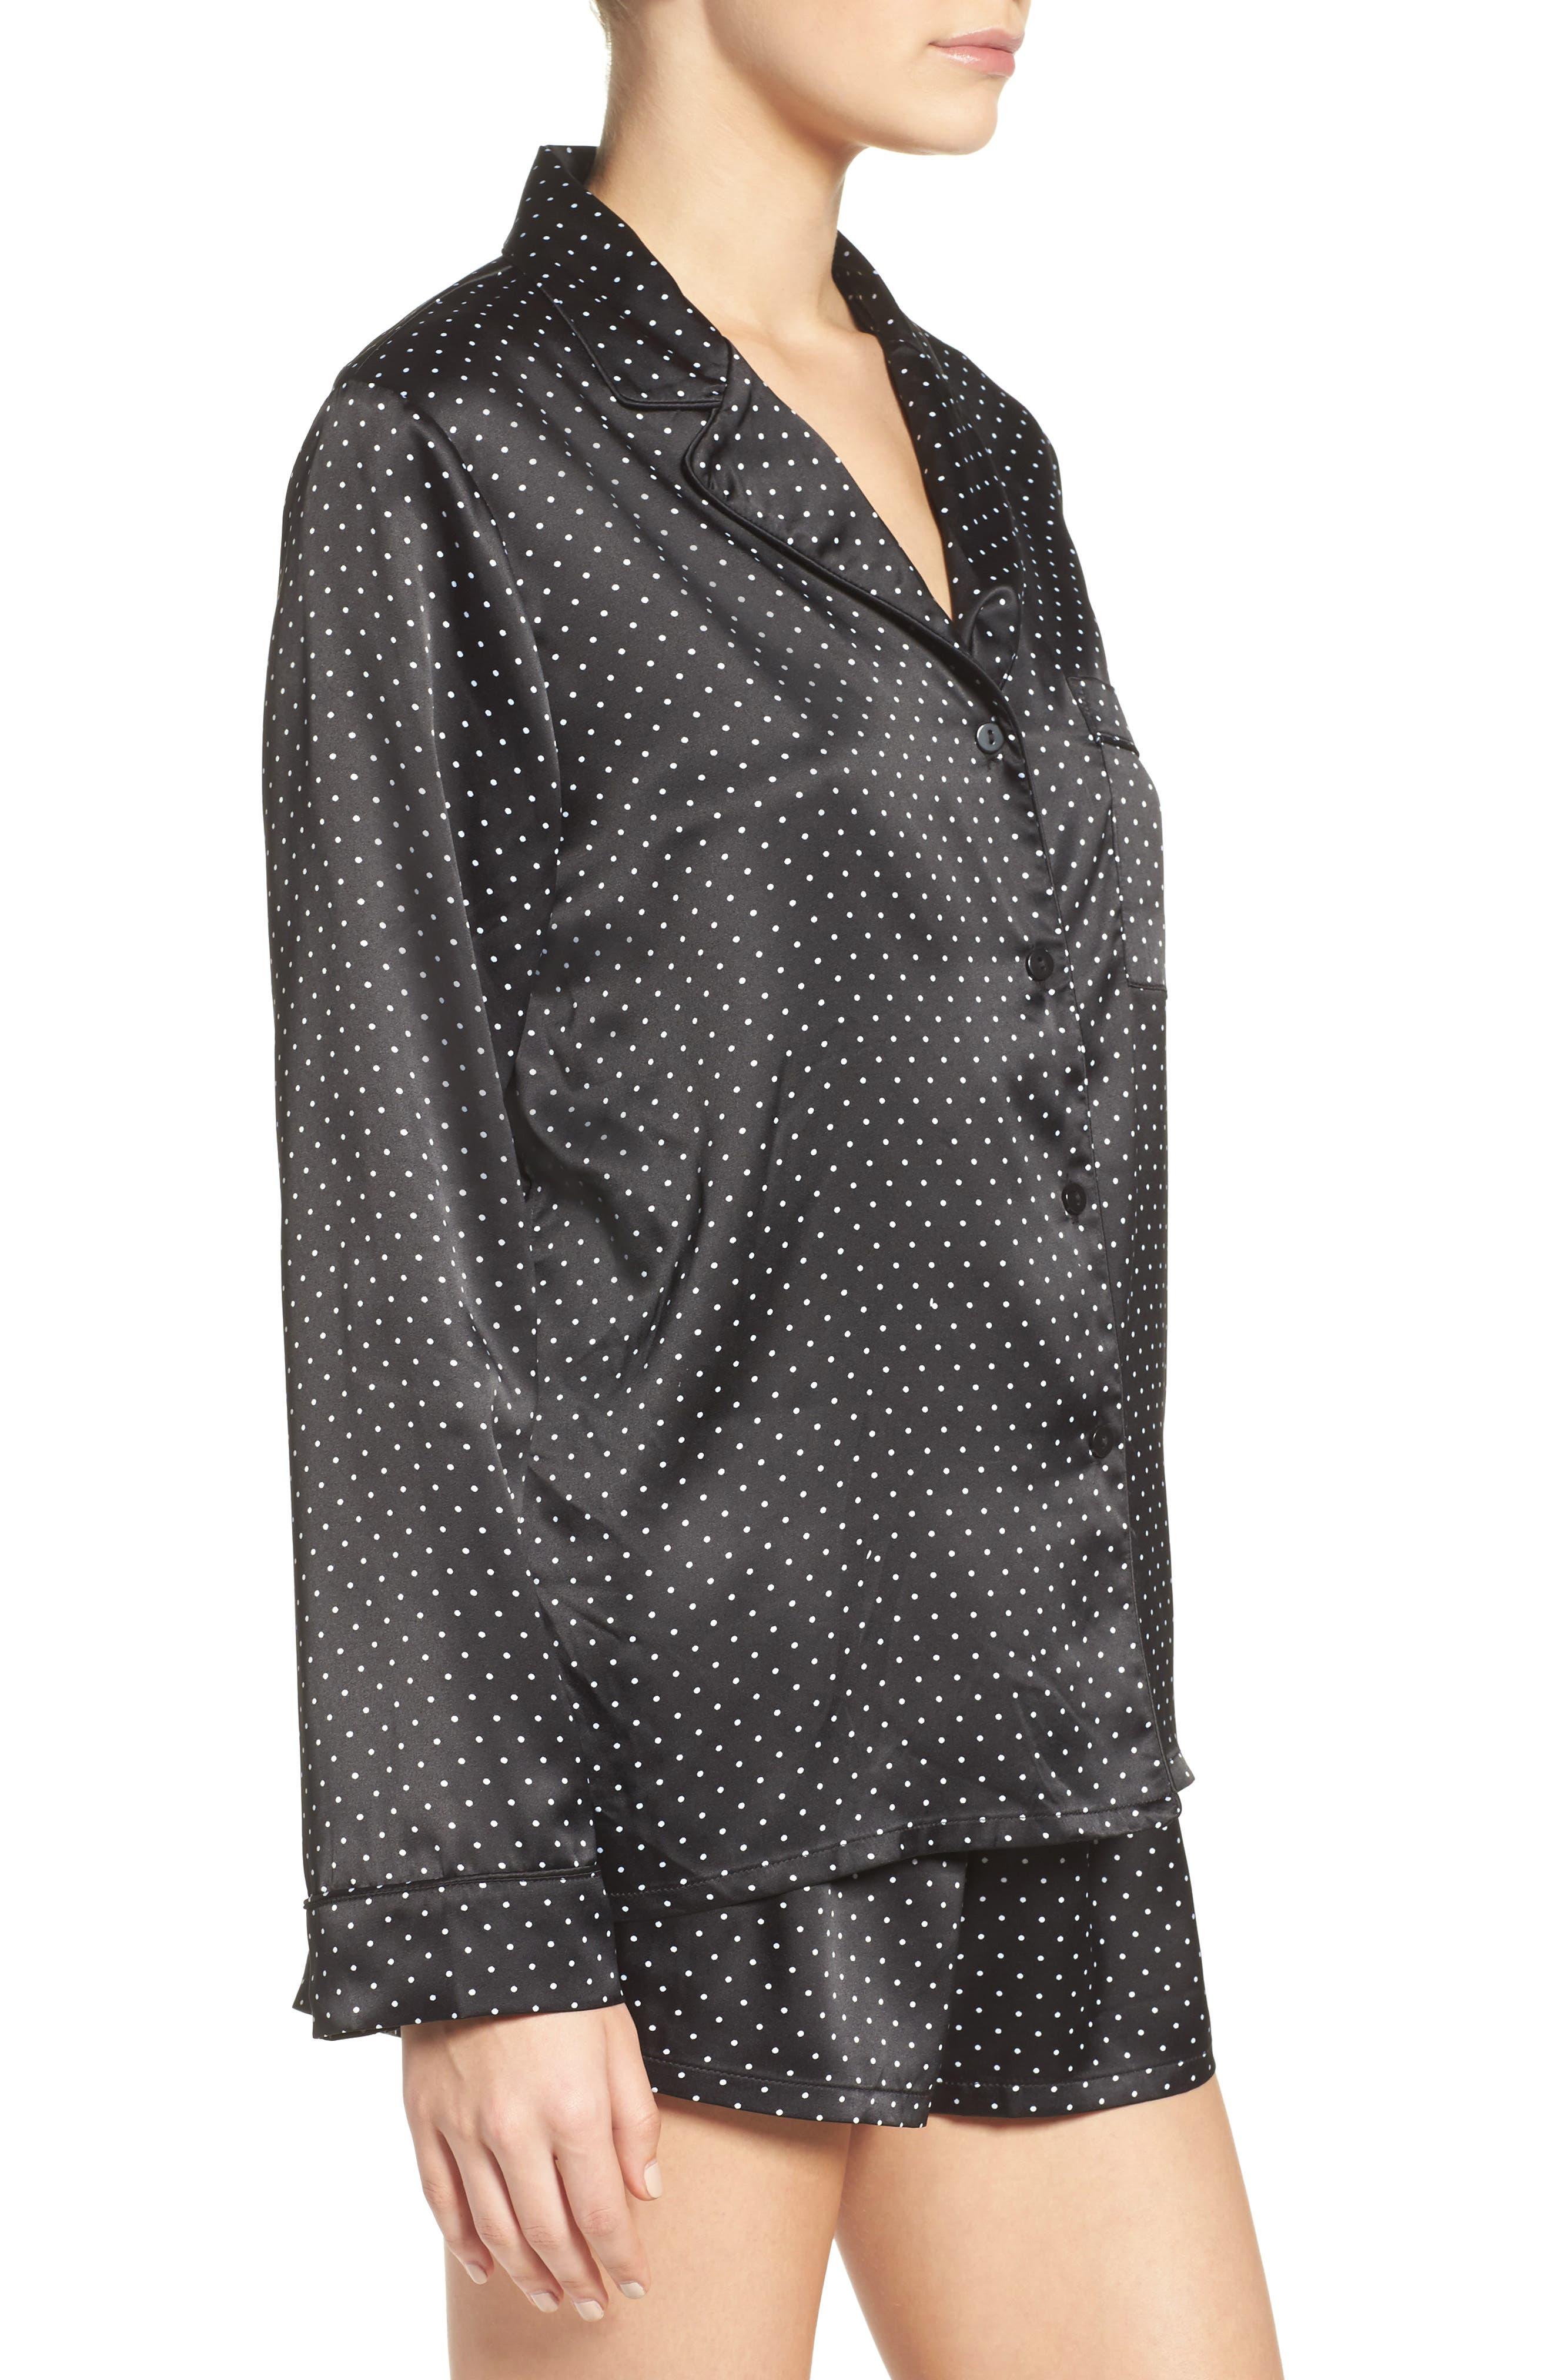 Alternate Image 3  - In Bloom by Jonquil Print Satin Pajamas